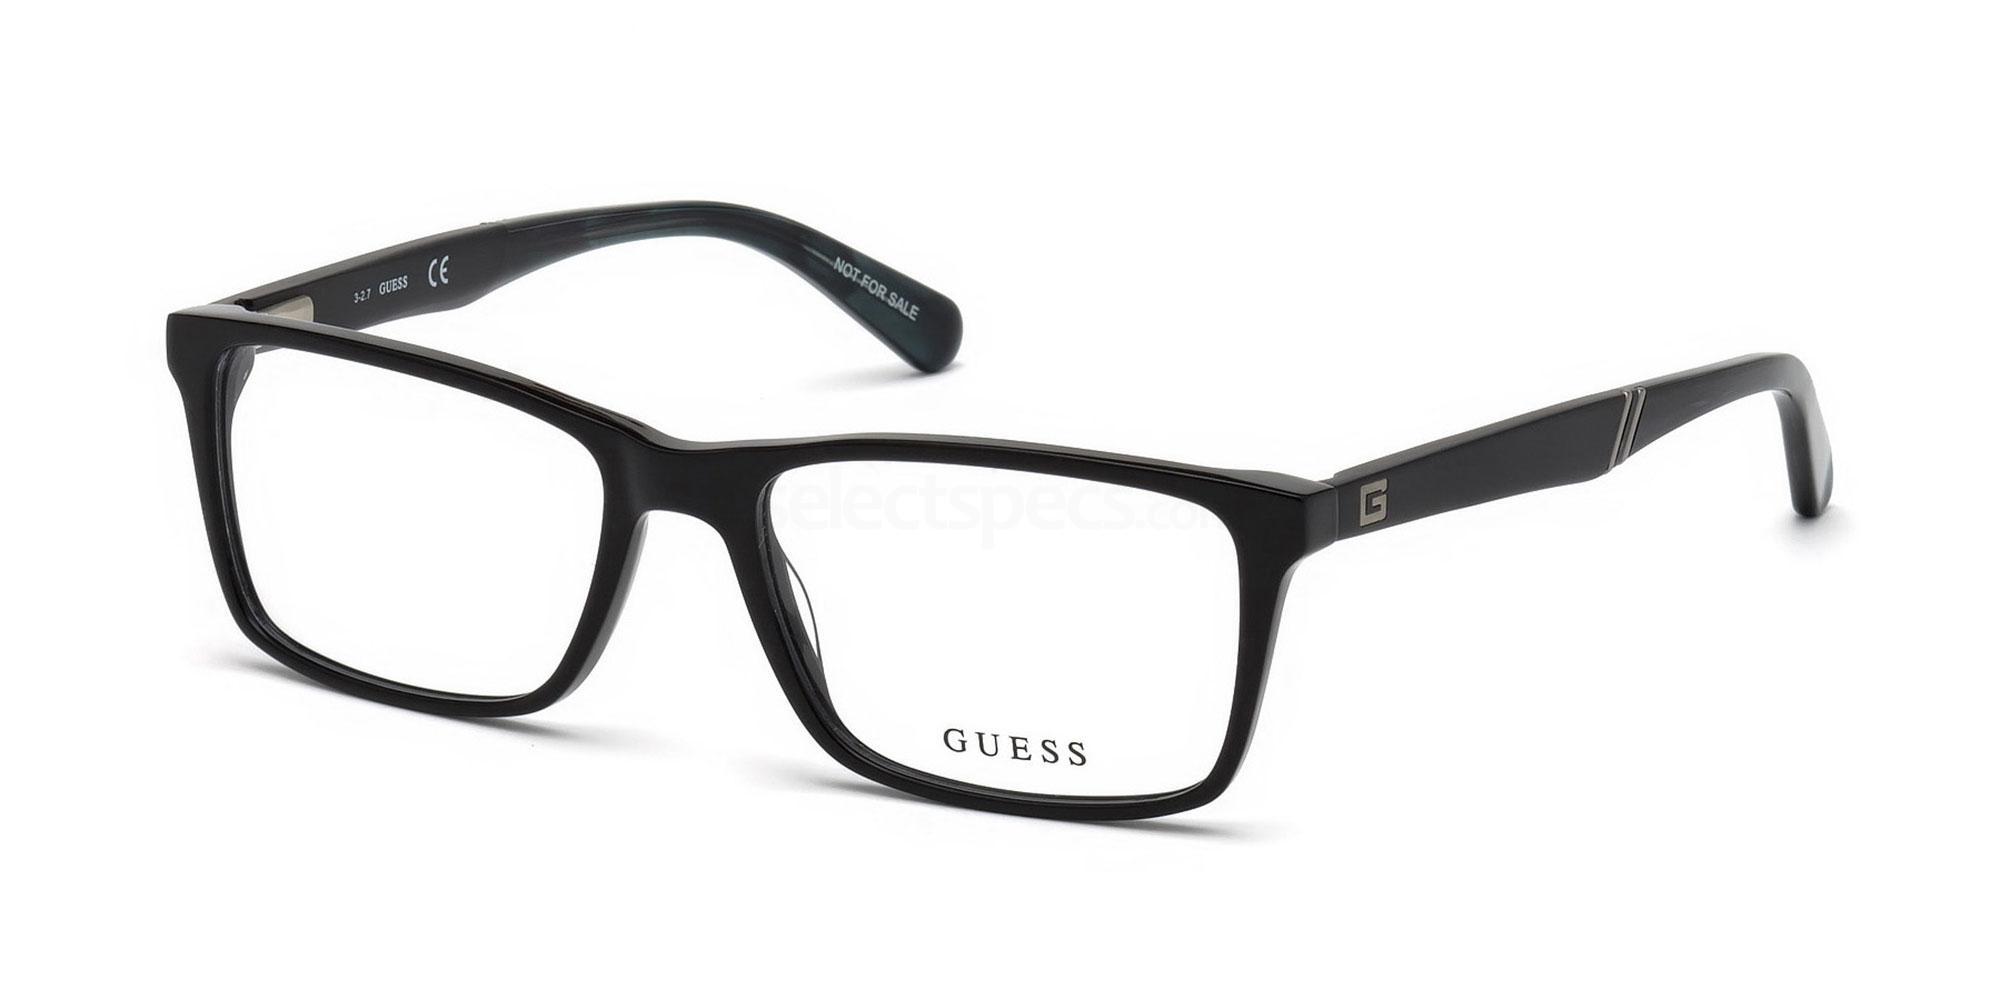 001 GU1954 Glasses, Guess